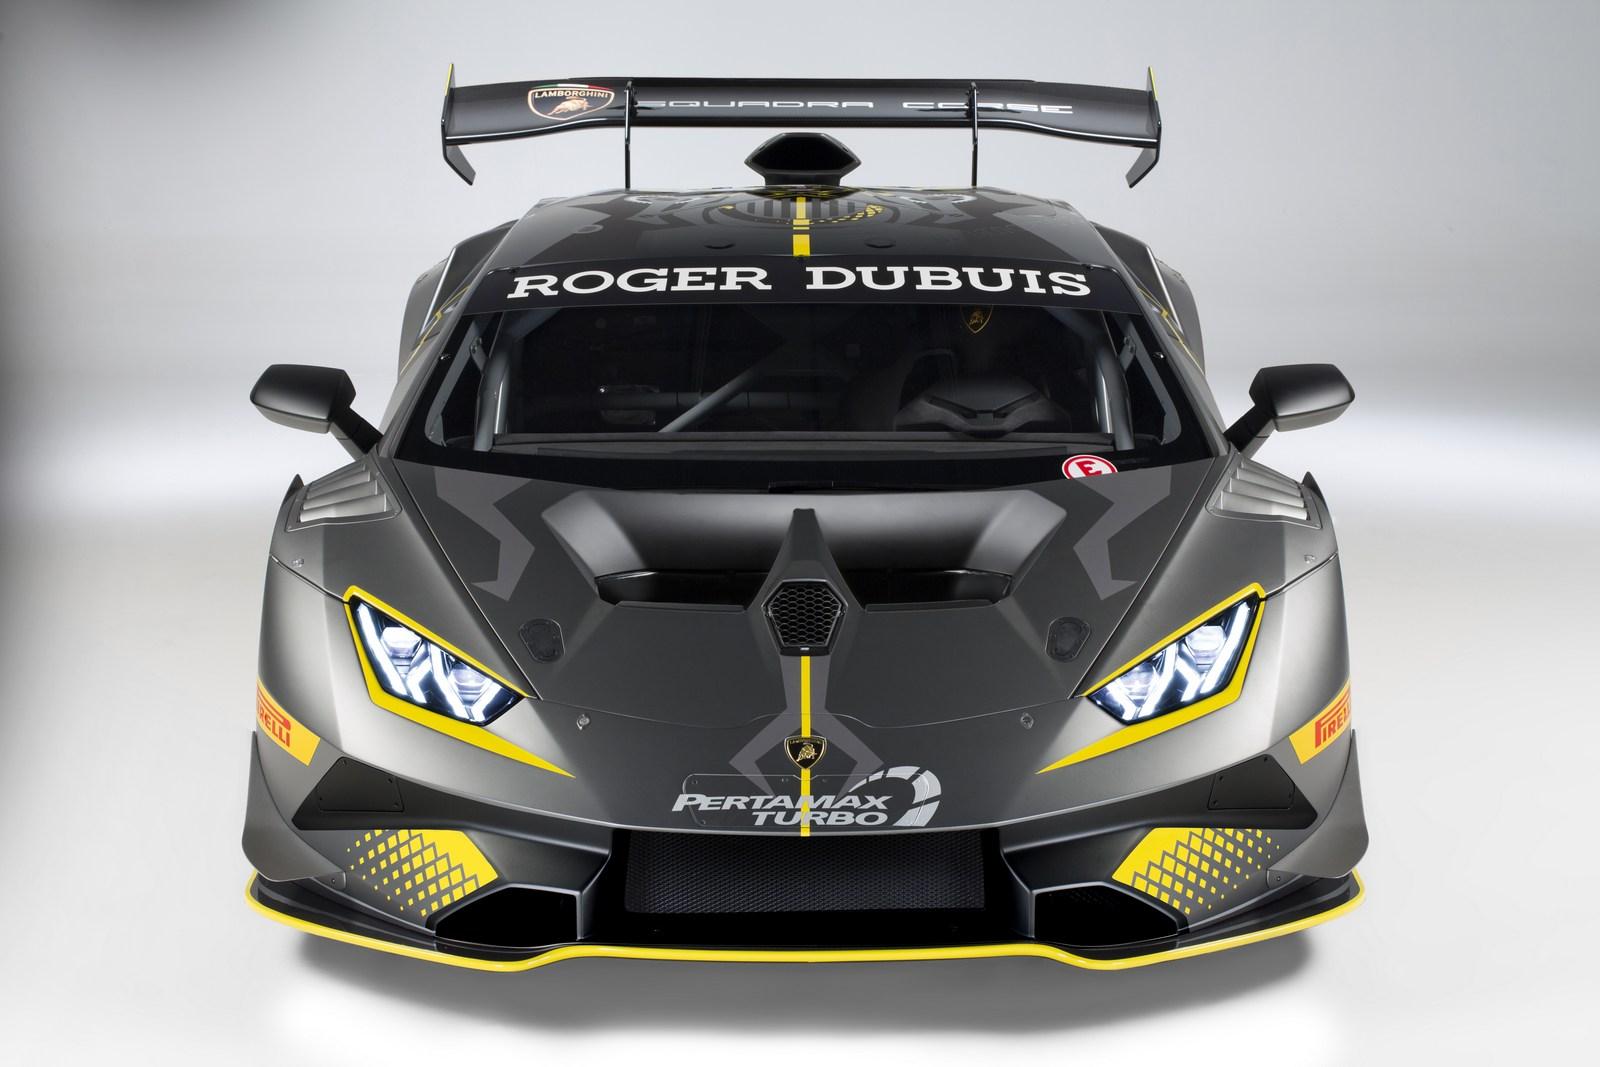 Video: Lamborghini Unveiled The Huracan With Improved Aerodynamics! 1